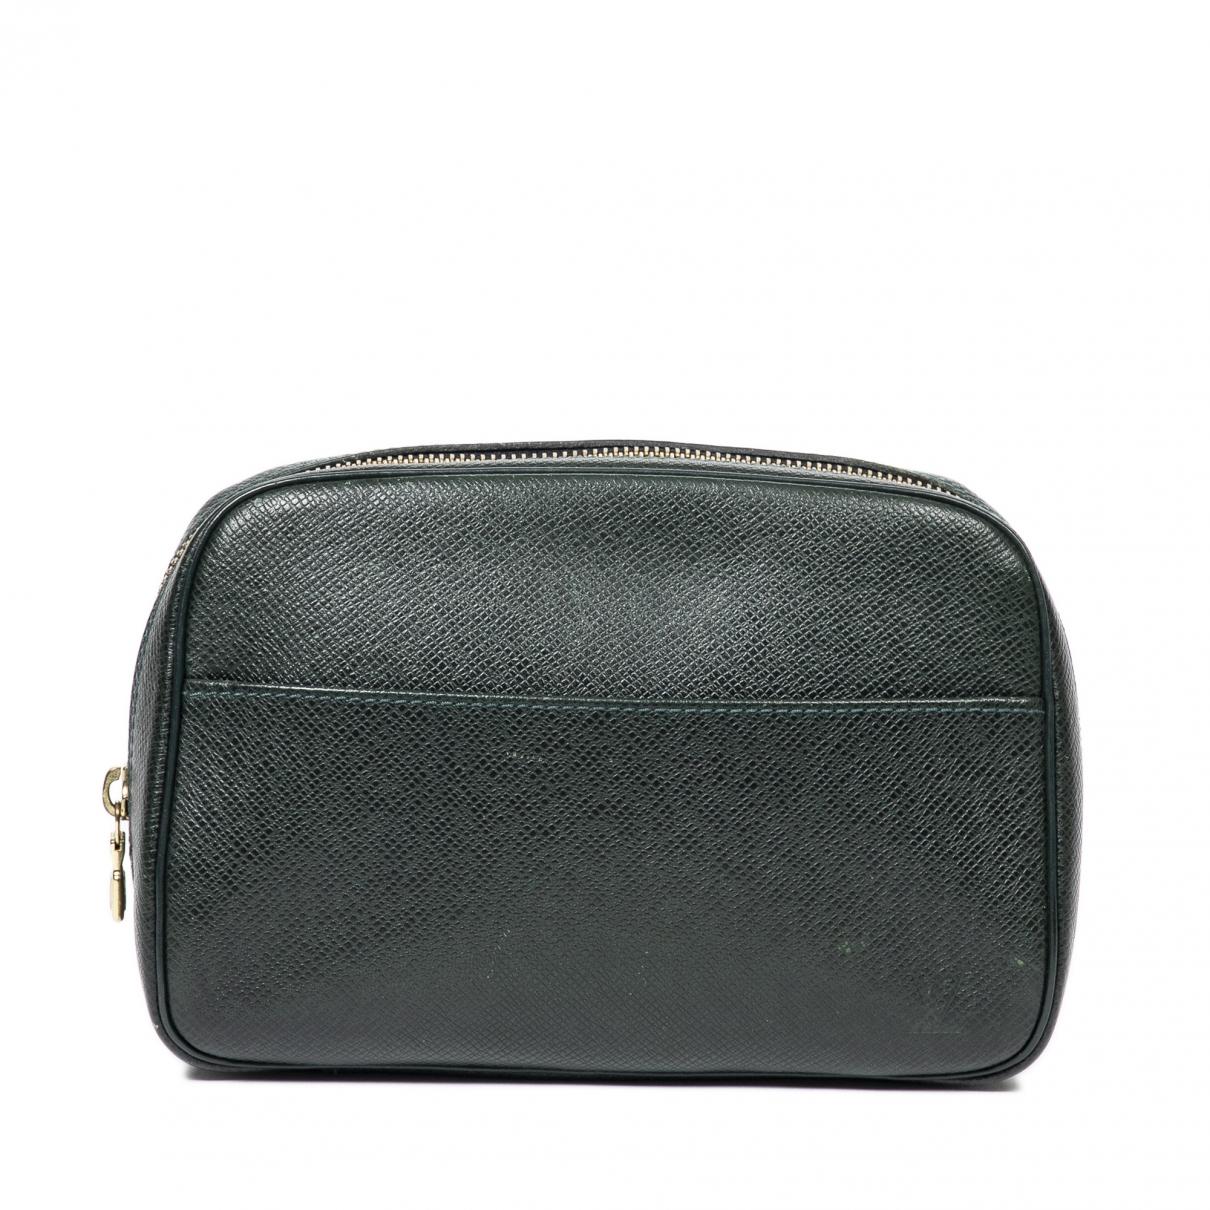 Louis Vuitton \N Green Leather Clutch bag for Women \N